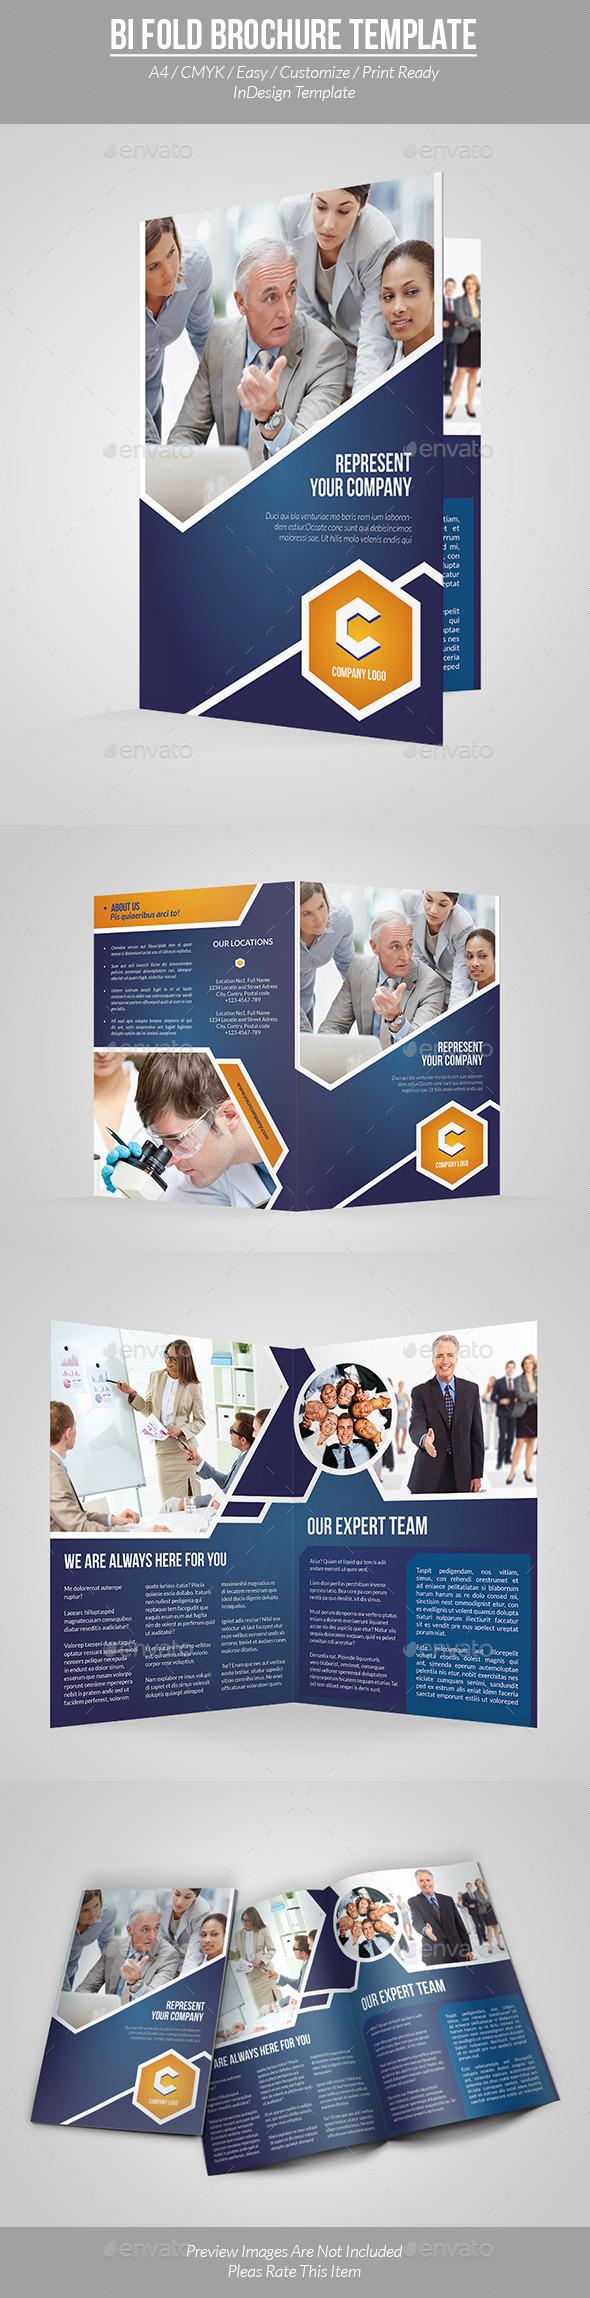 GraphicRiver Bi Fold Brochure Template 9557710